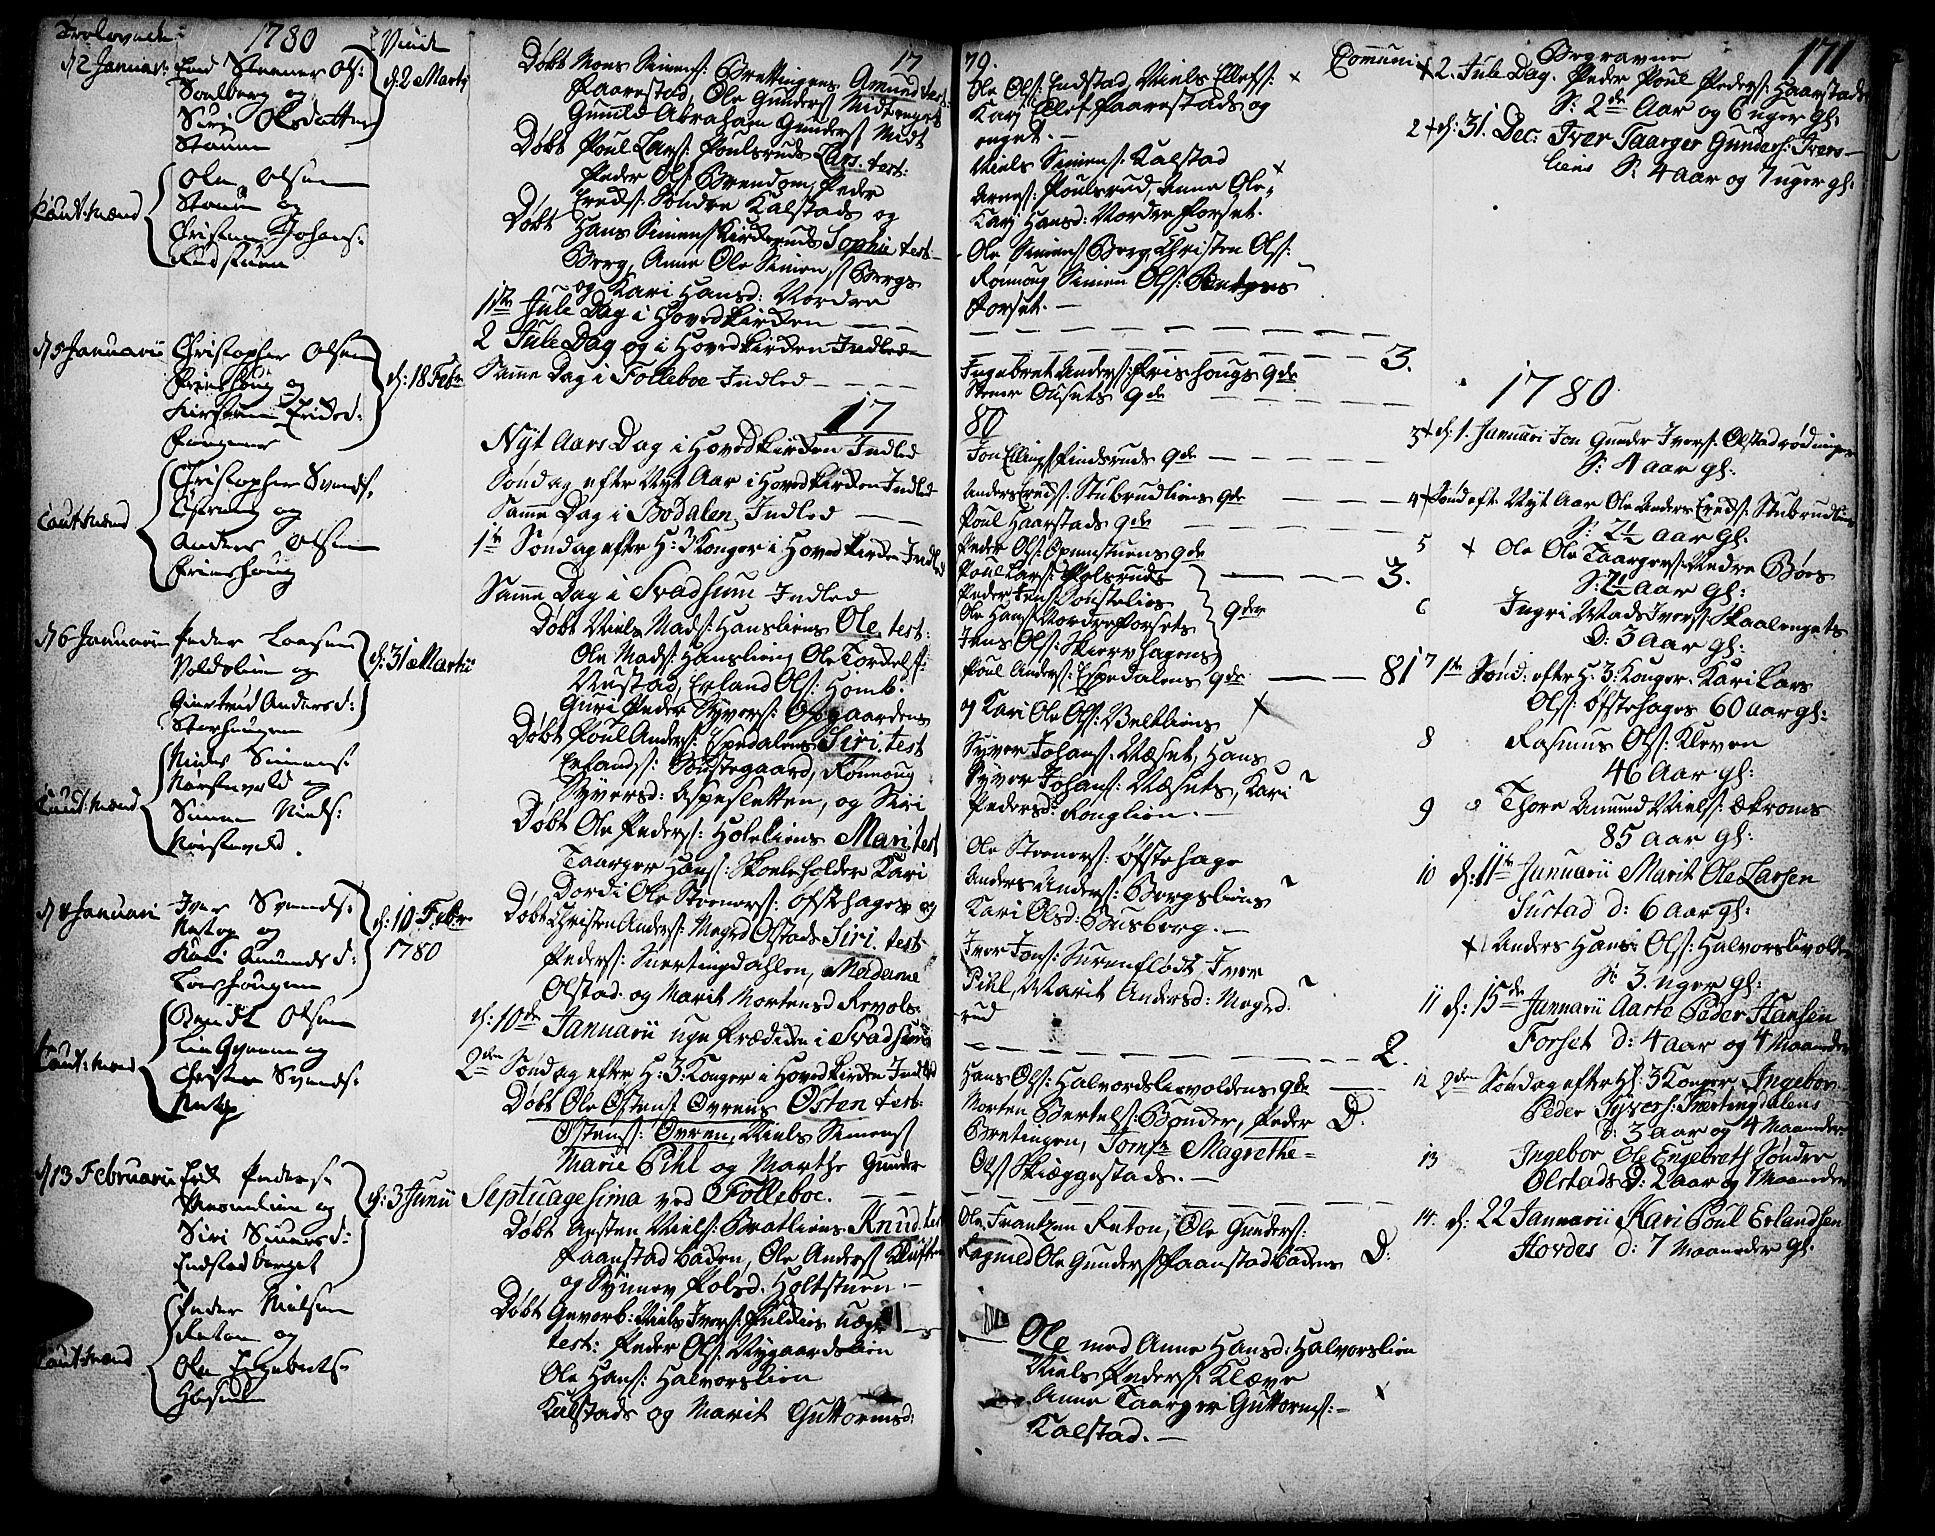 SAH, Gausdal prestekontor, Ministerialbok nr. 3, 1758-1809, s. 171